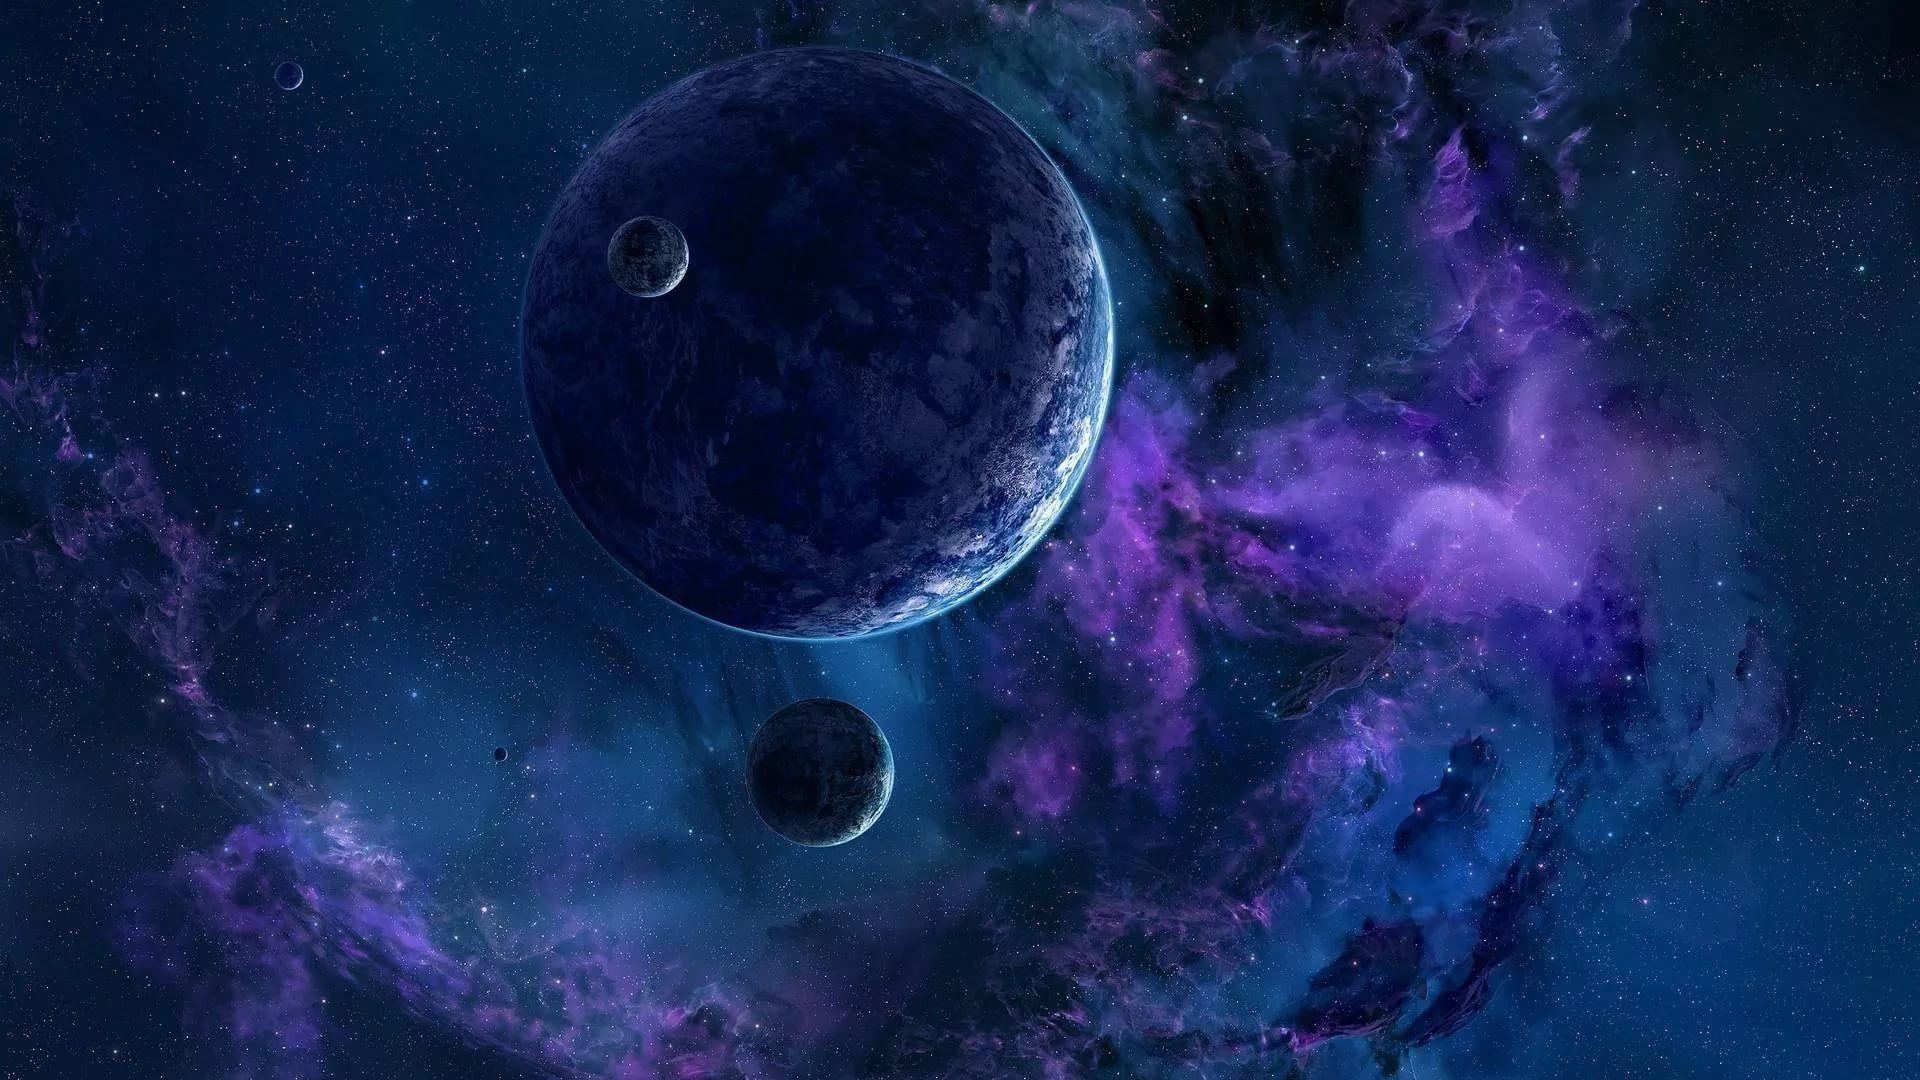 Blue Galaxy Wallpaper Theme